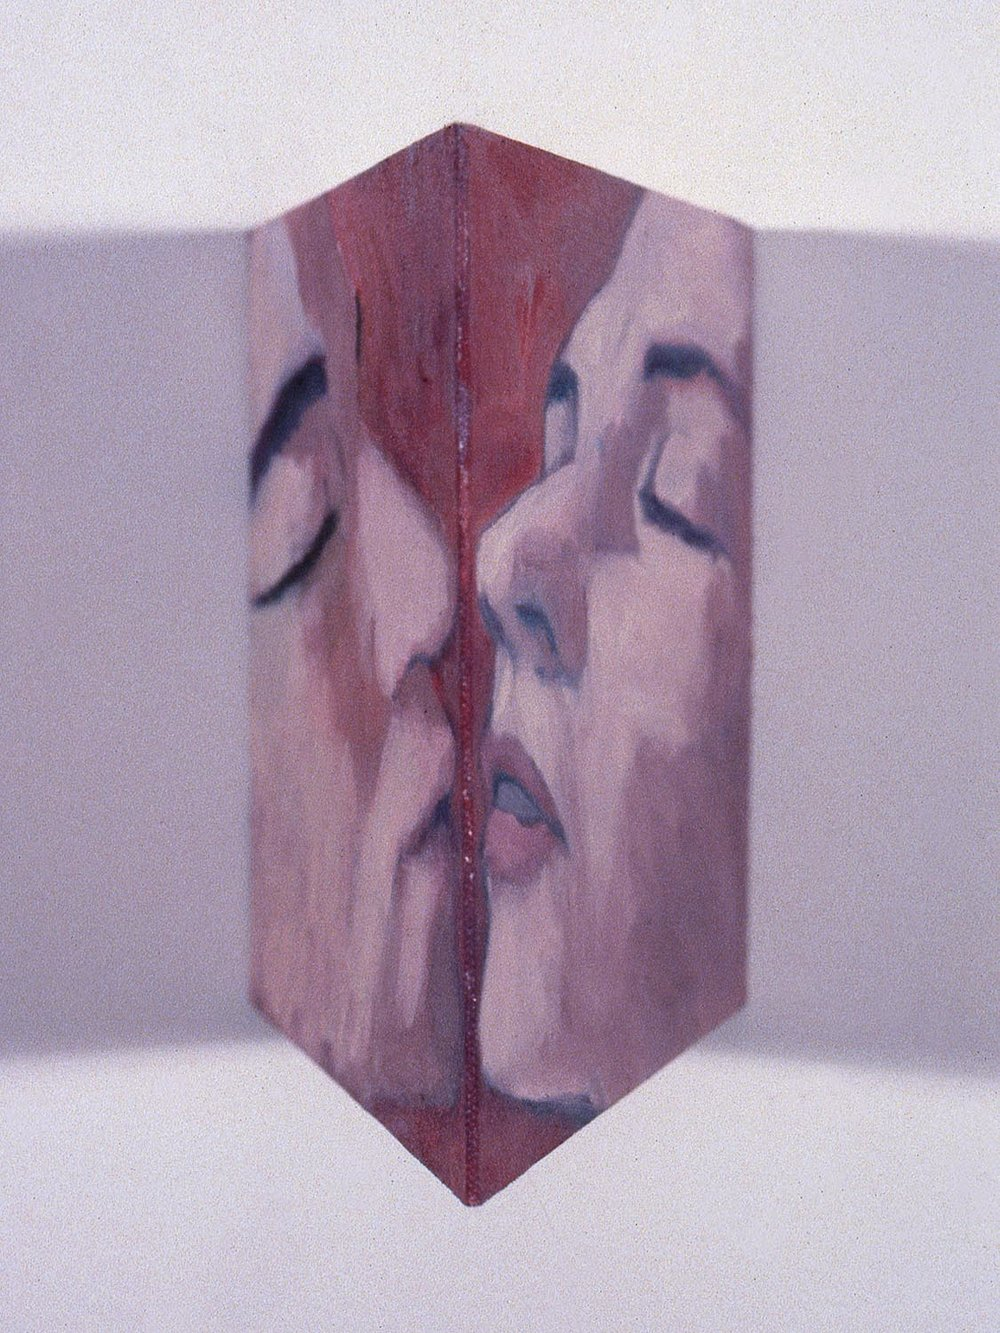 Le Baiser (The Kiss), 1985